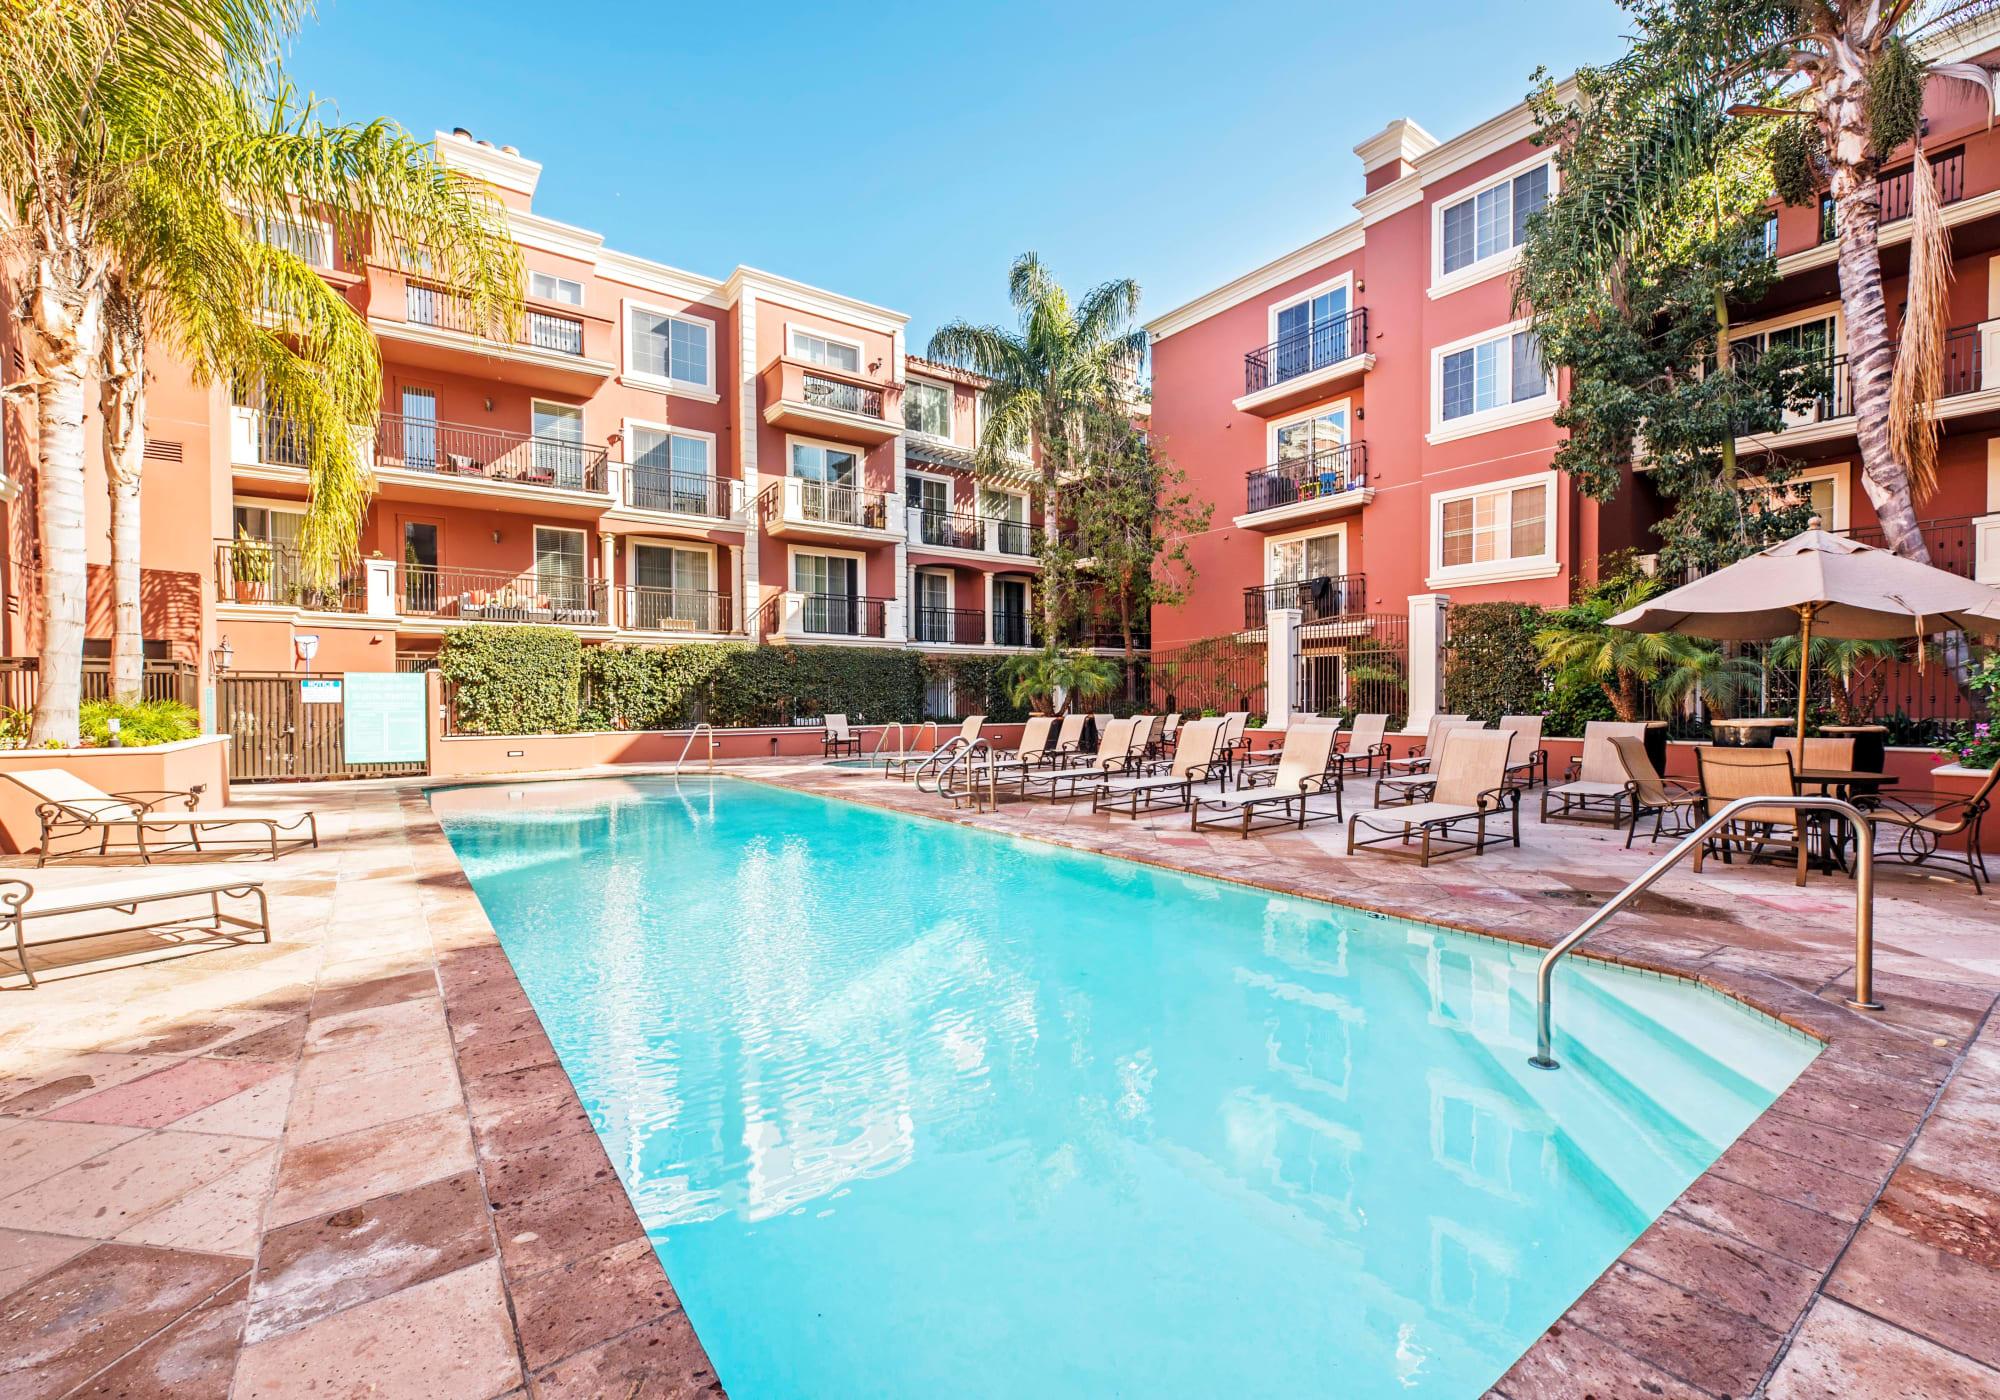 Resort-style swimming pool on a beautiful day at The Villa at Marina Harbor in Marina del Rey, California